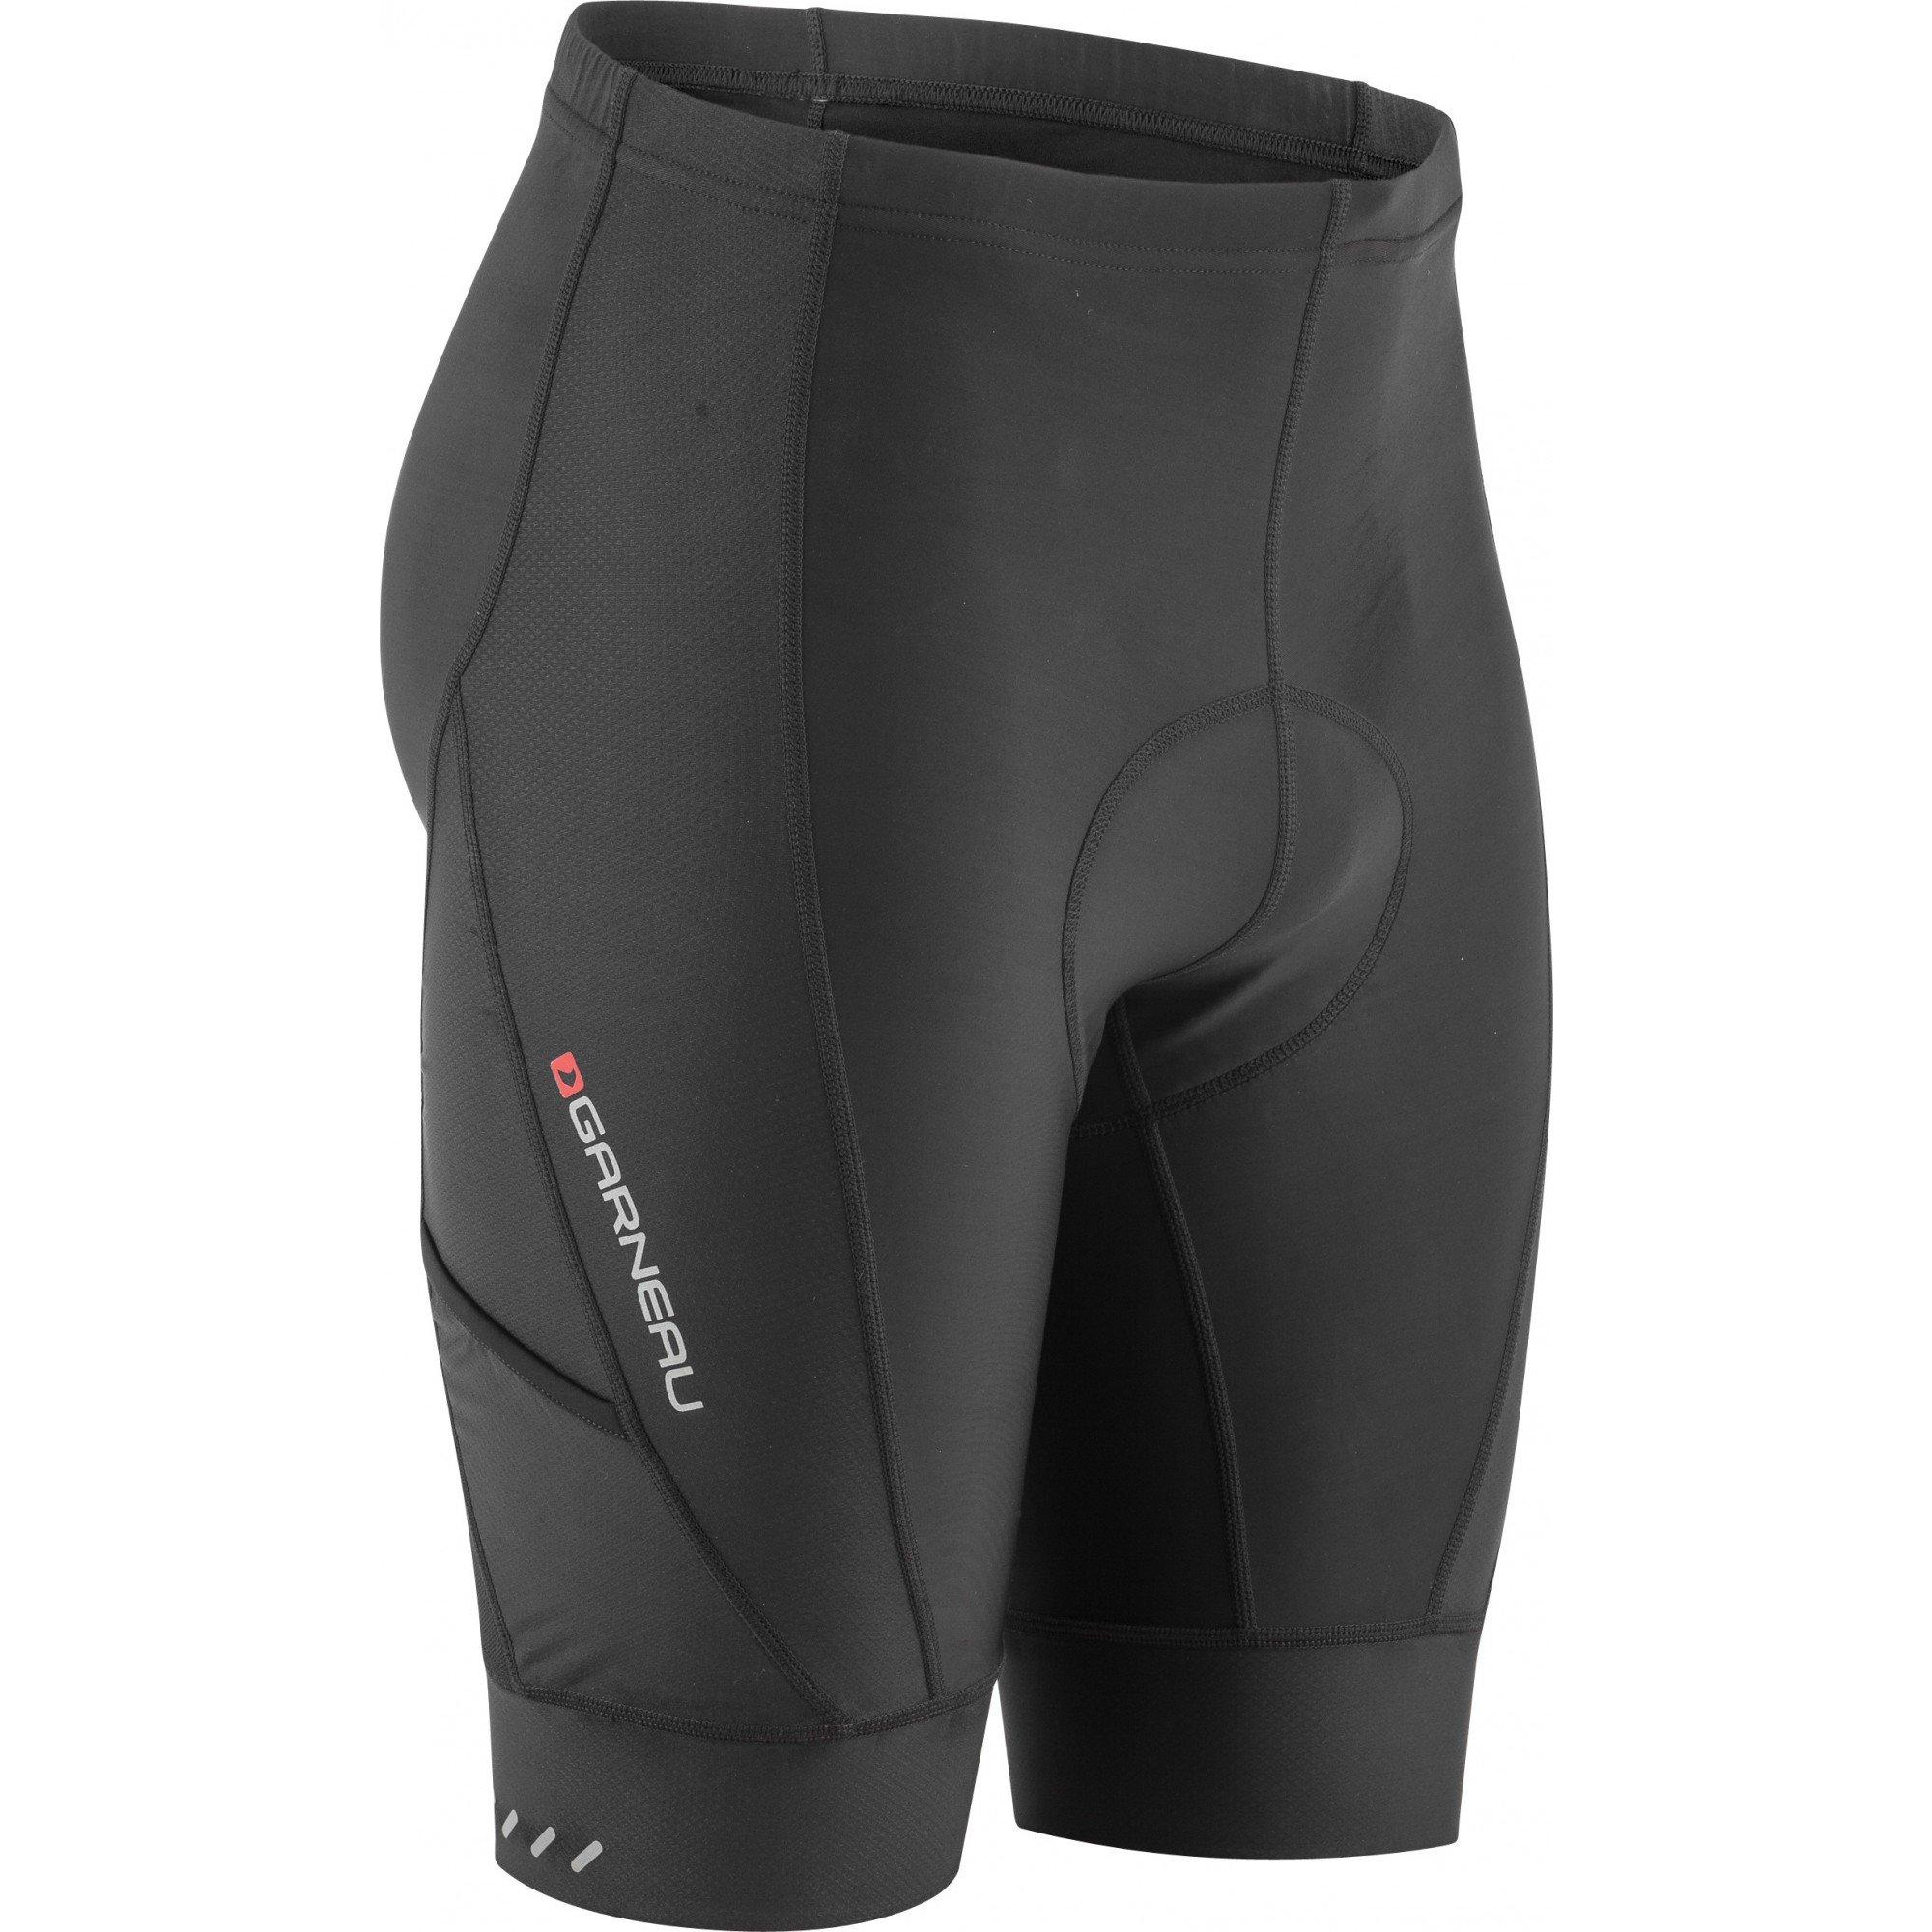 Louis Garneau Men's Optimum Bike Shorts, Black, Small